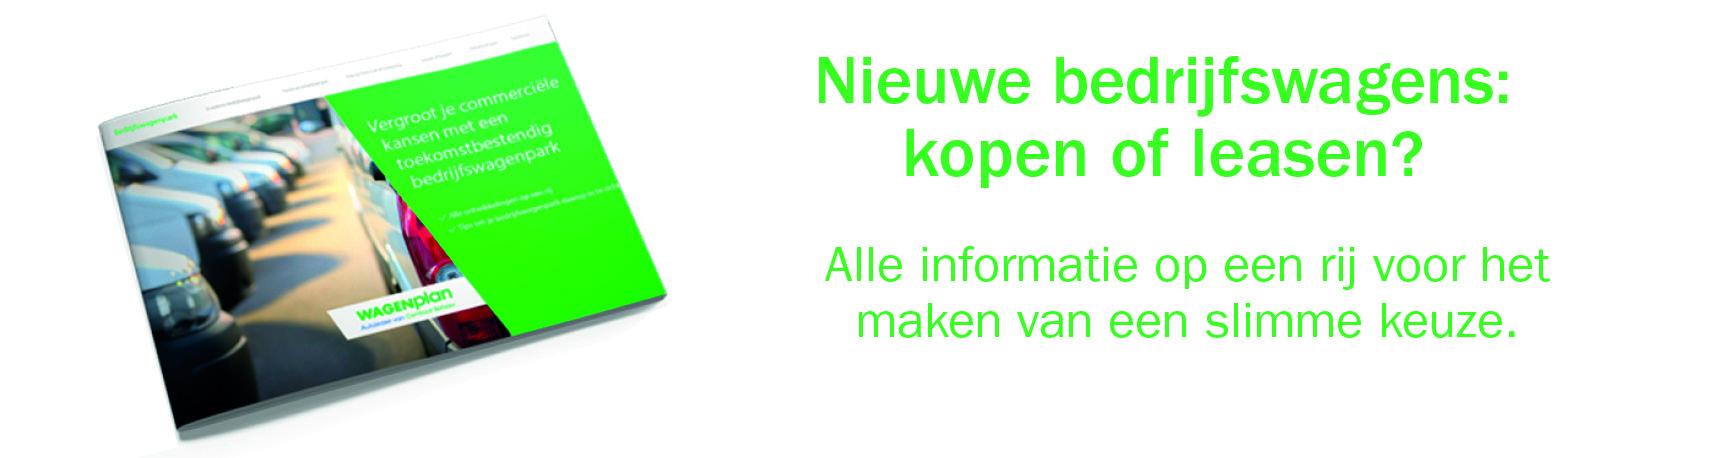 e-book-kopen-leasen-bedrijfswagens